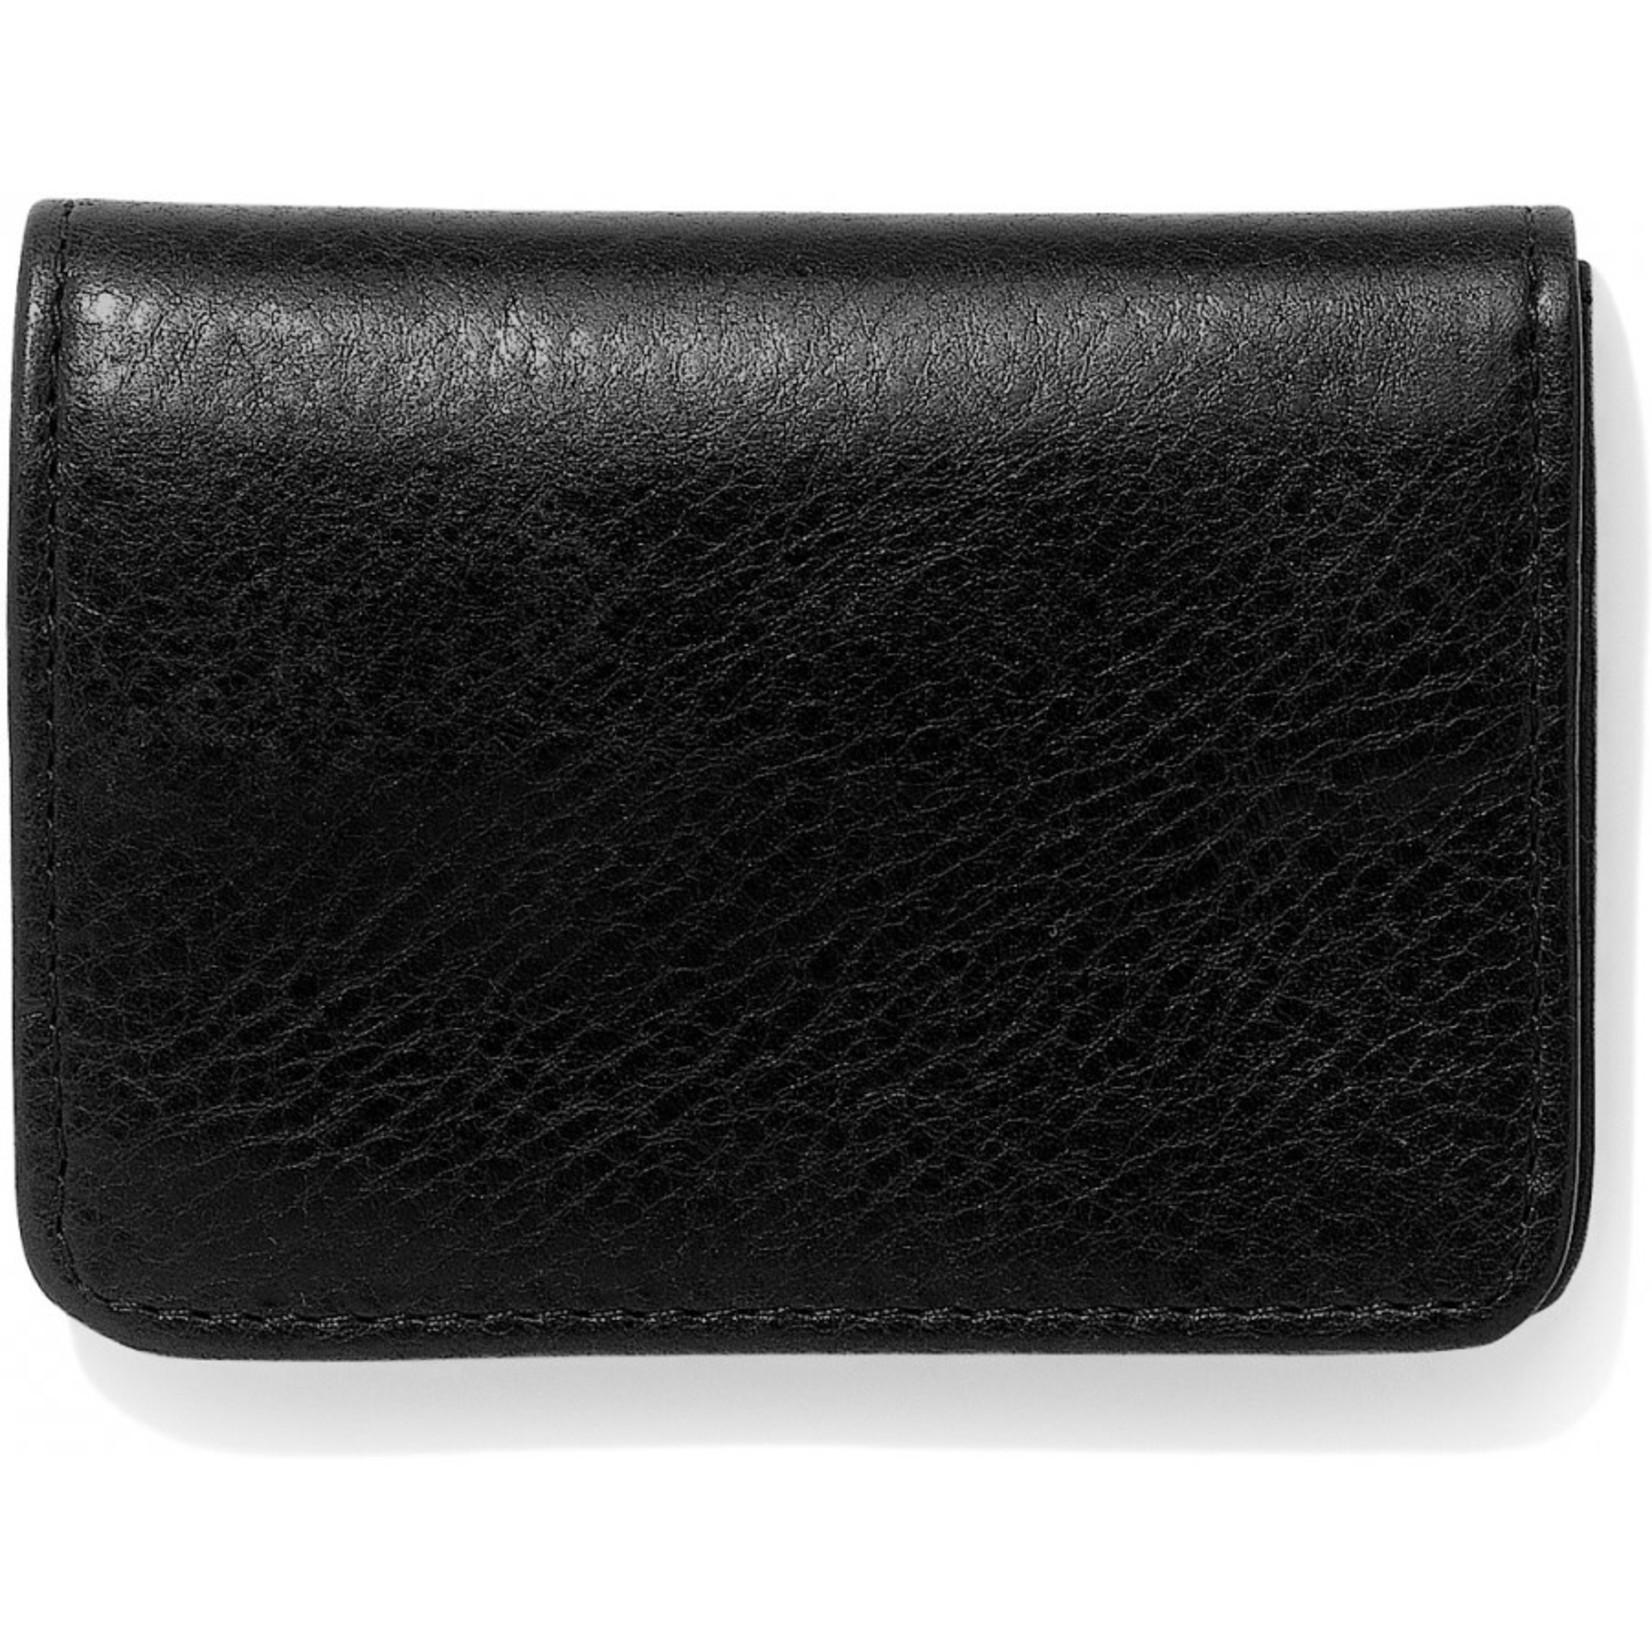 Brighton Carnegie Flip Wallet in Black